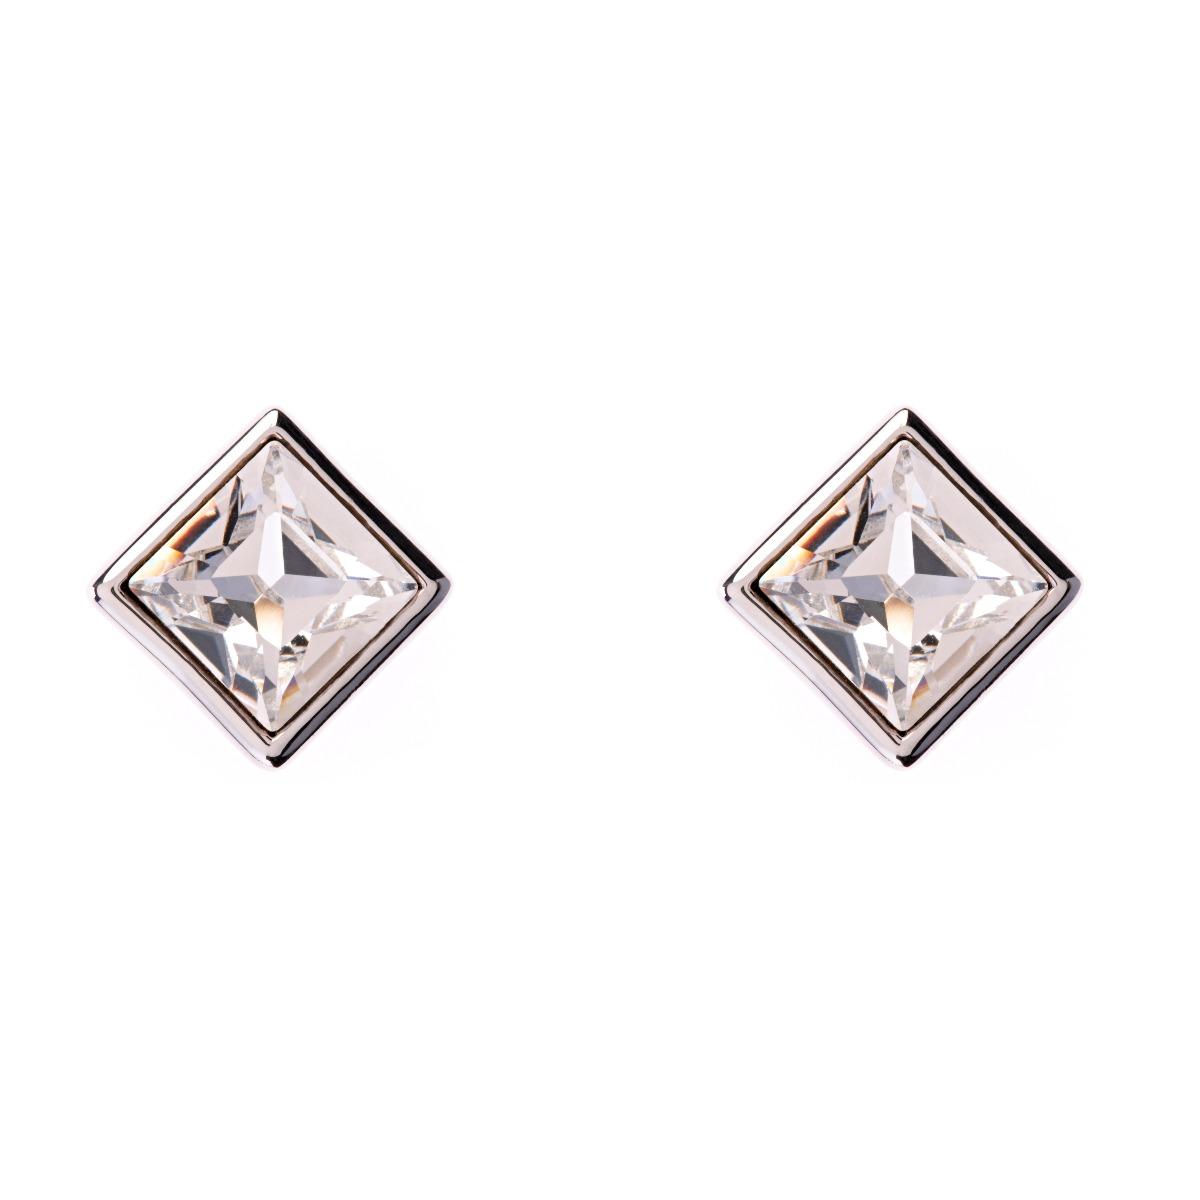 Claudette Square Crystal Stud Earrings